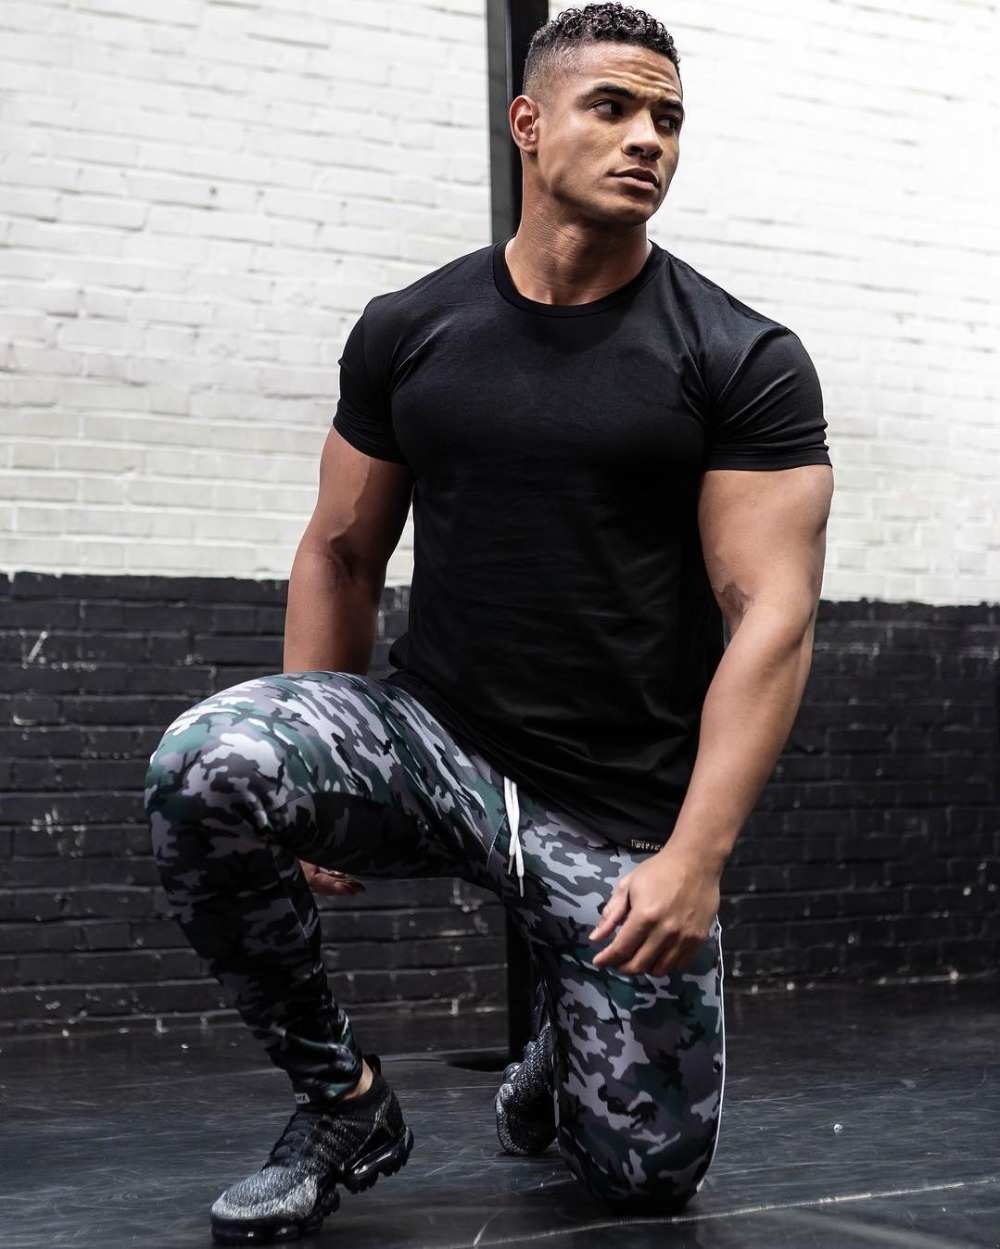 Joggers Pants Men 2020 Camouflage Colour Patchwork Men Pants Fitness Sportswear Sweatpants Male Casual Leggings Trousers 21